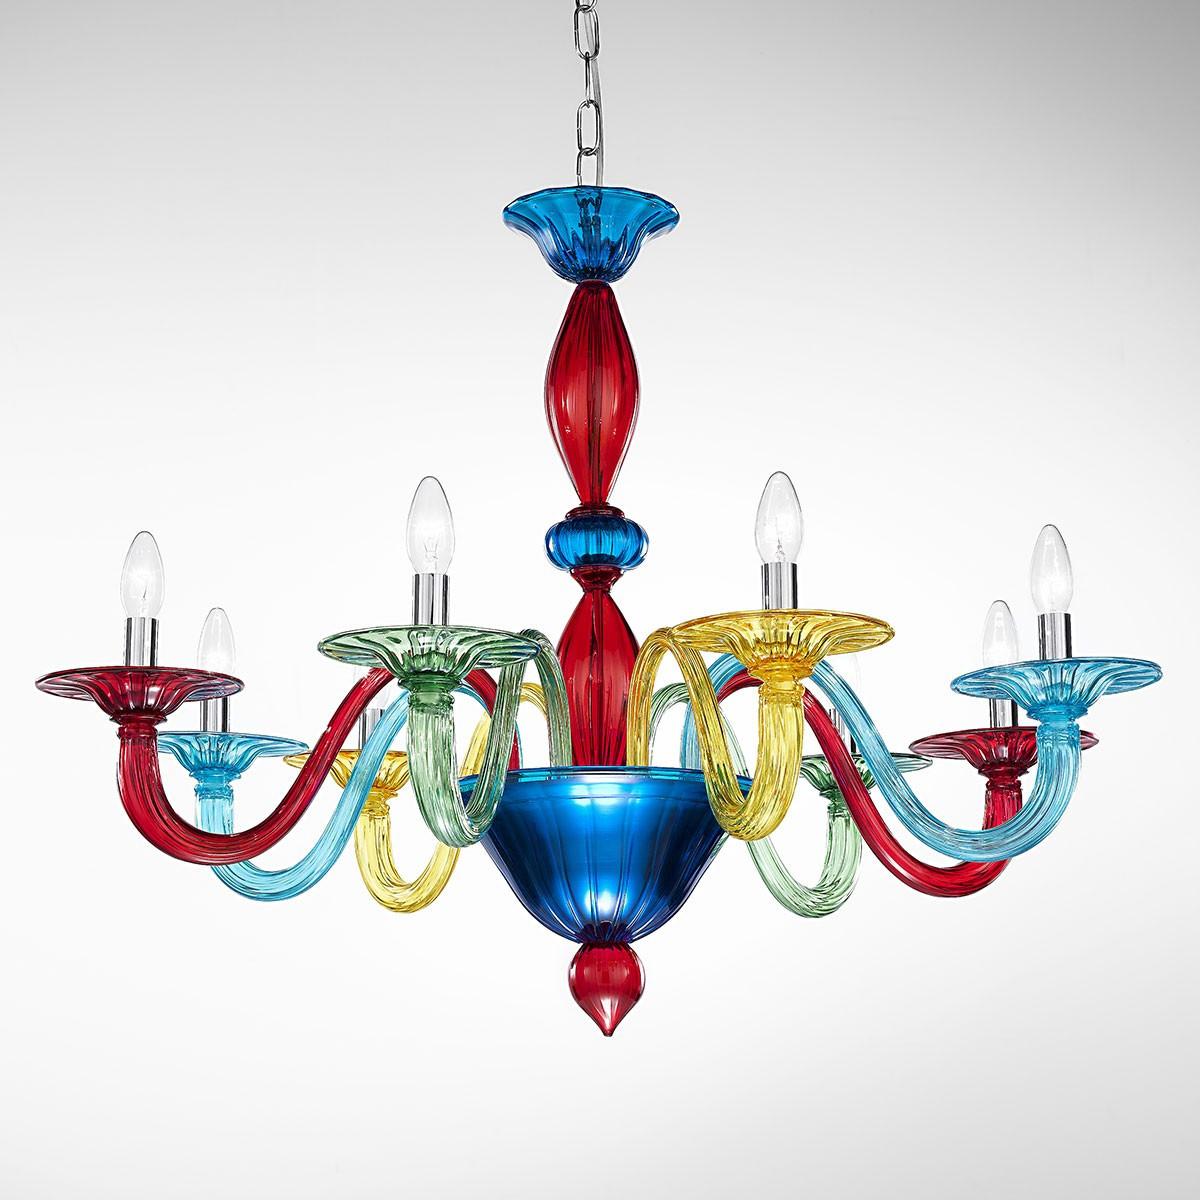 """Iride"" lampara de araña de Murano - 8 luces - multicolor"